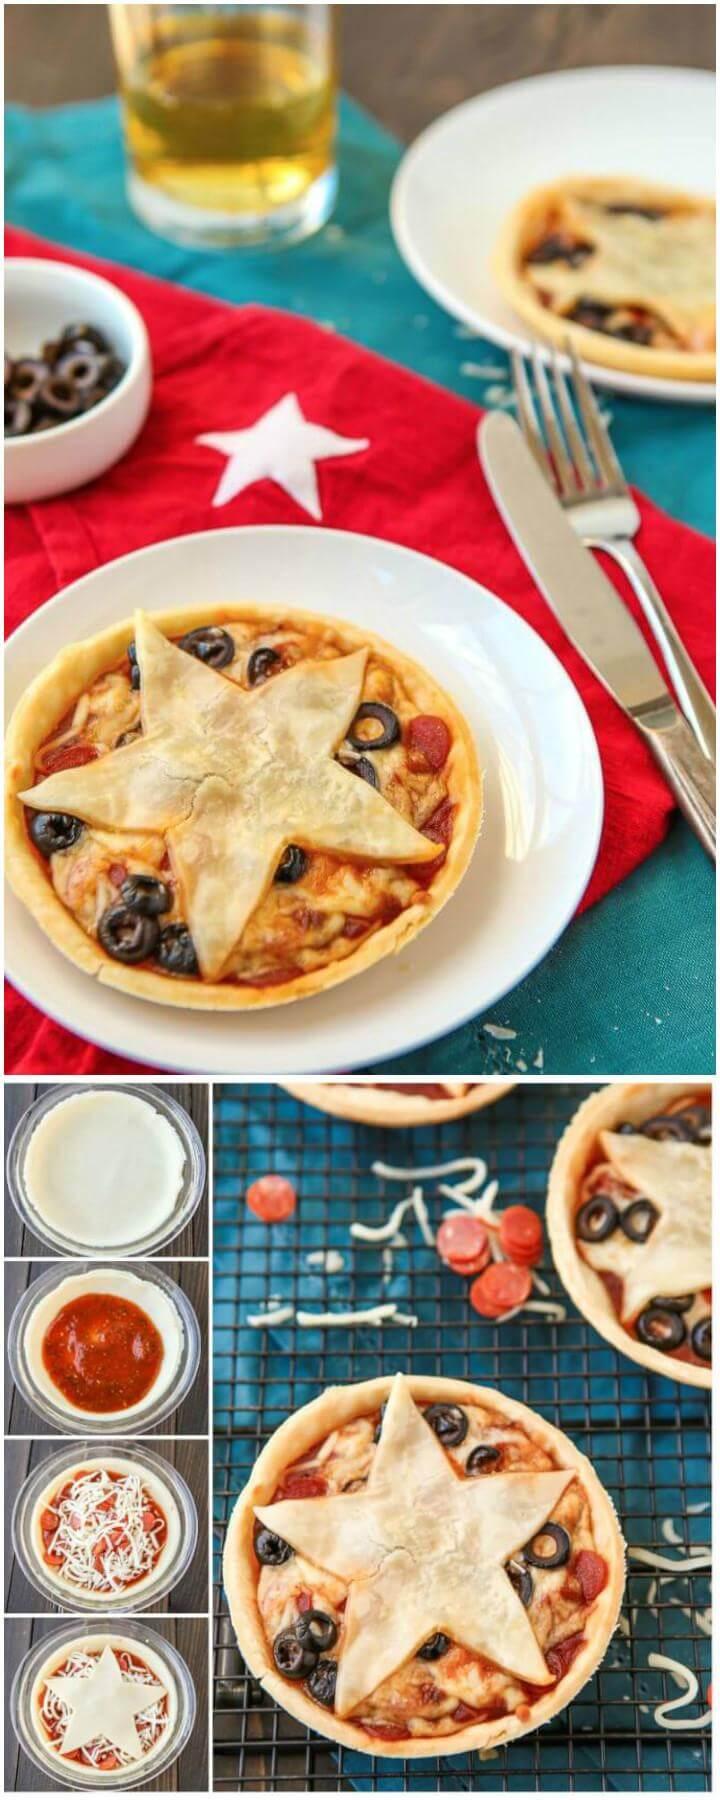 DIY Timeless Minni Pizza Pies Idea de fiesta de cumpleaños para adolescentes